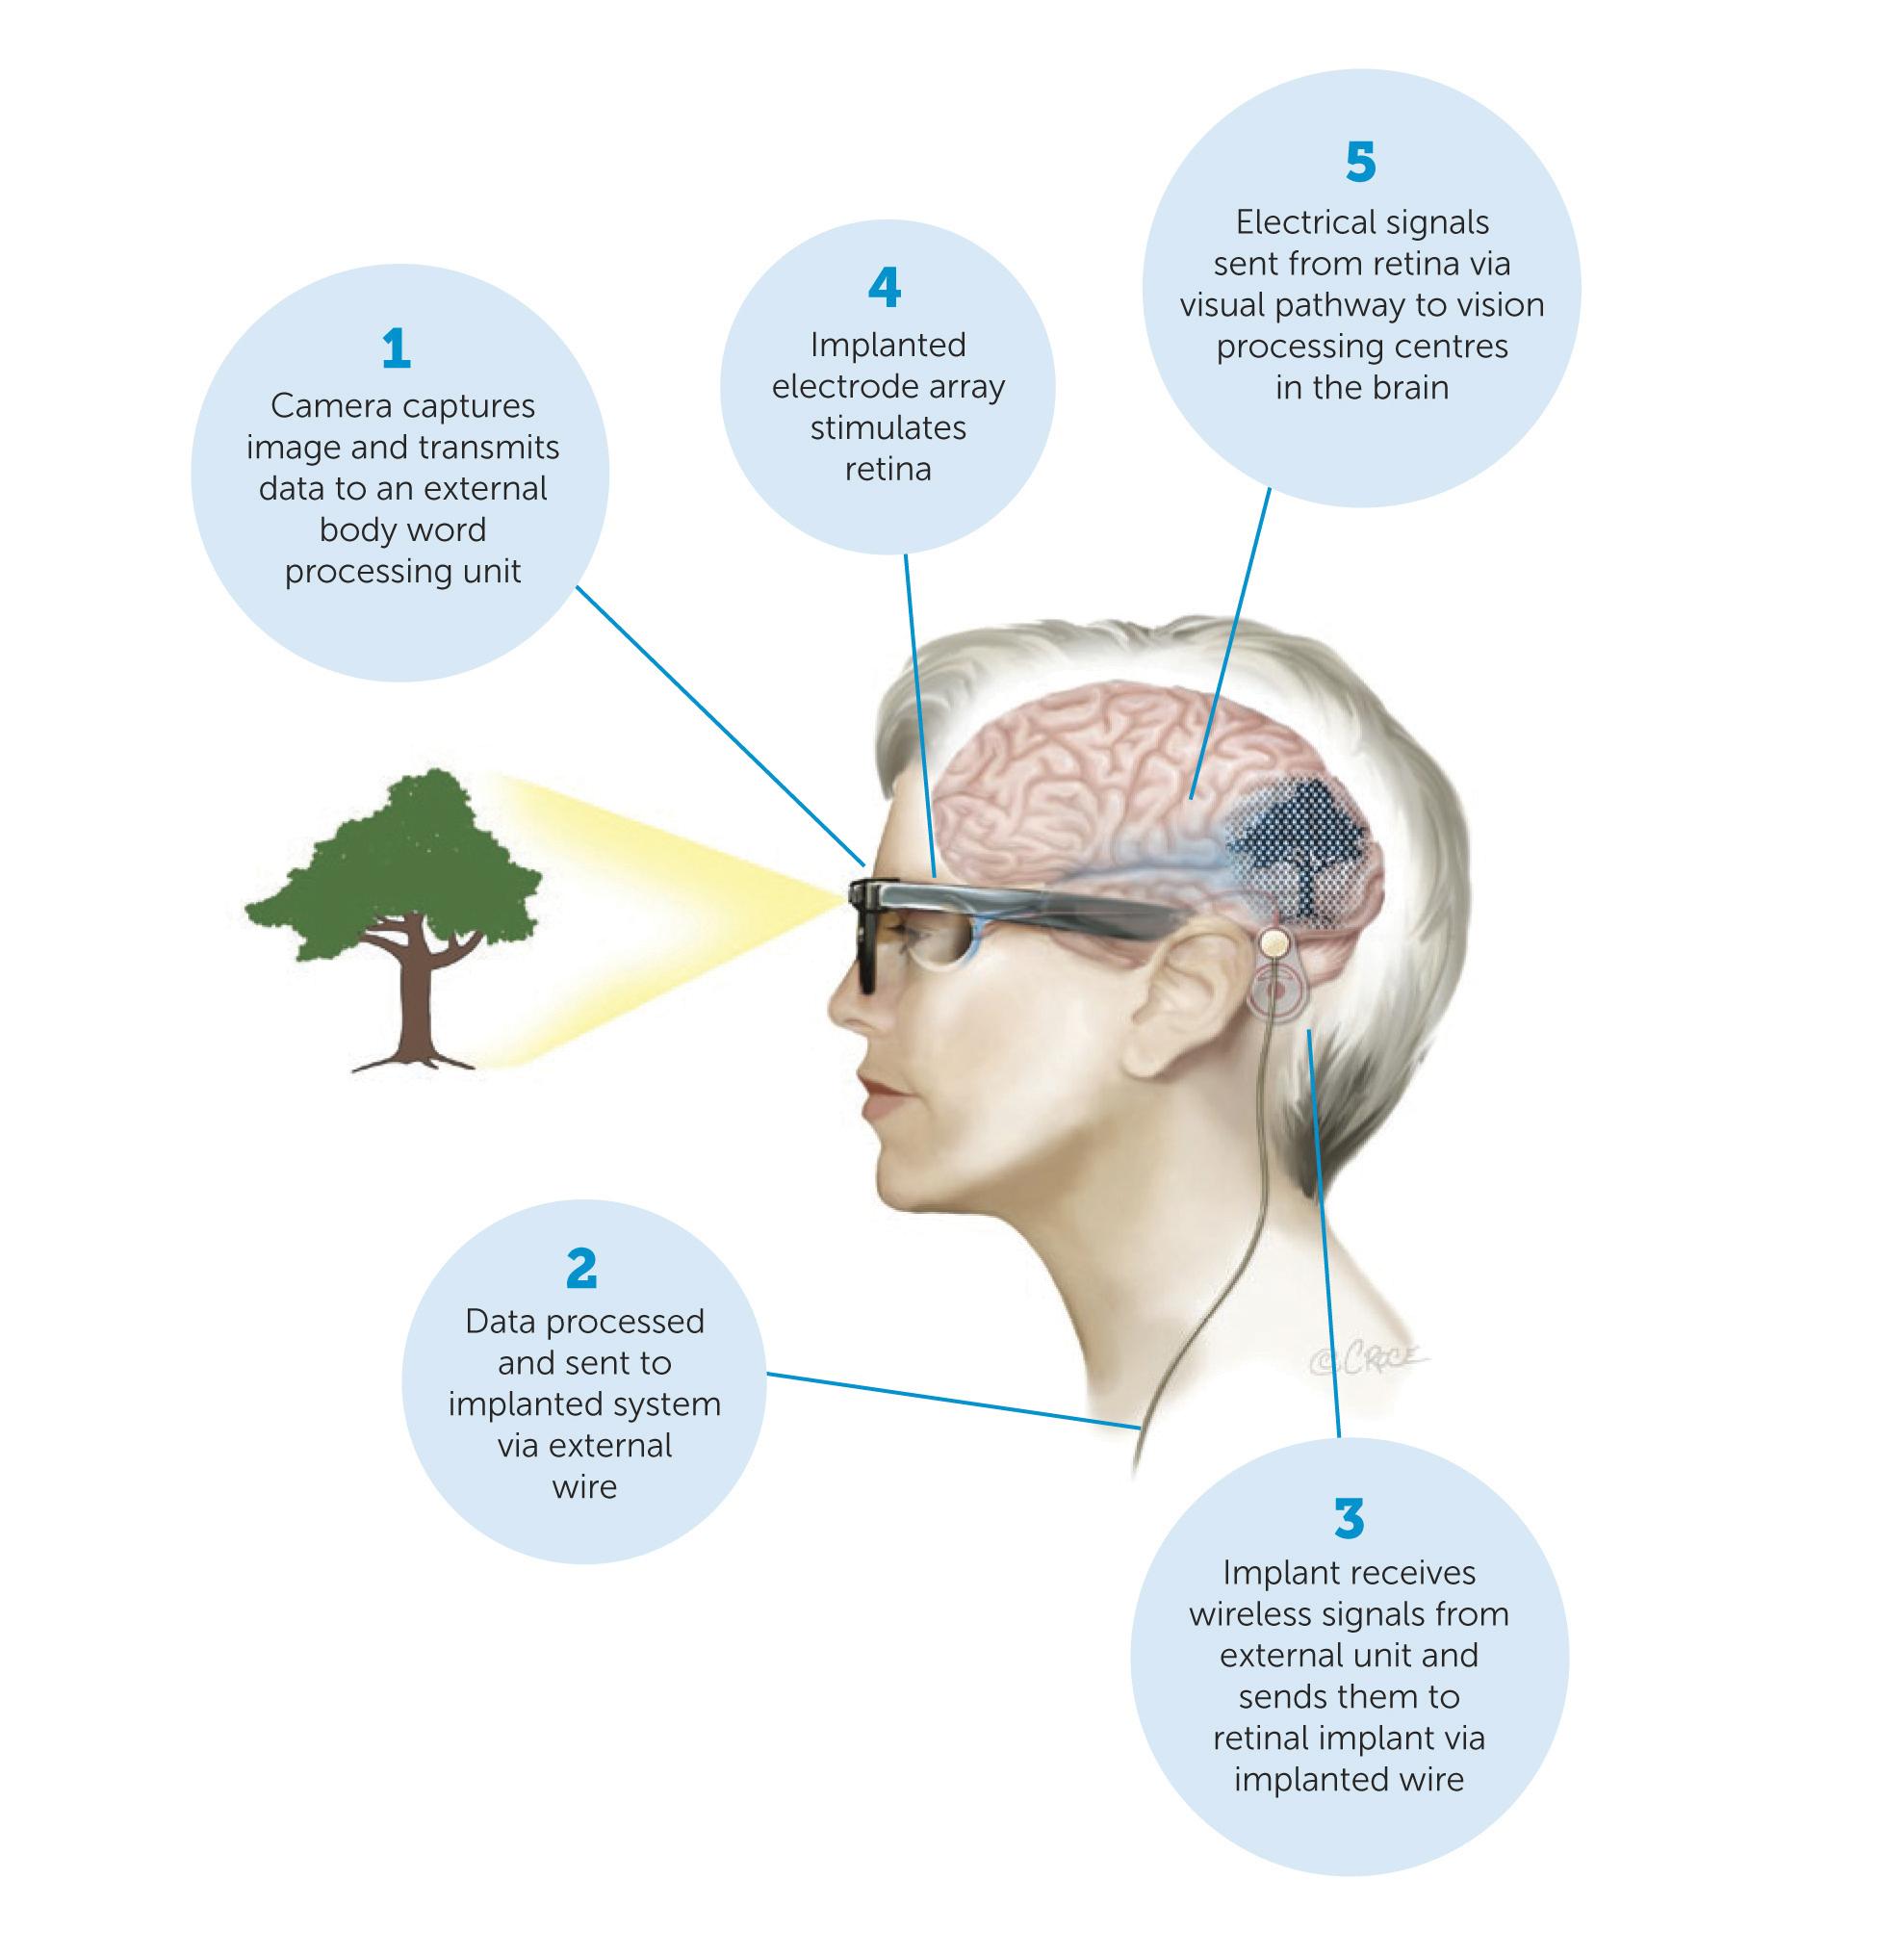 Developing a bionic eye scientist live retinal implant innovator bionic vision technologies bvt has had raised us 18 million au235 million from hong kong based china huarong international ccuart Choice Image